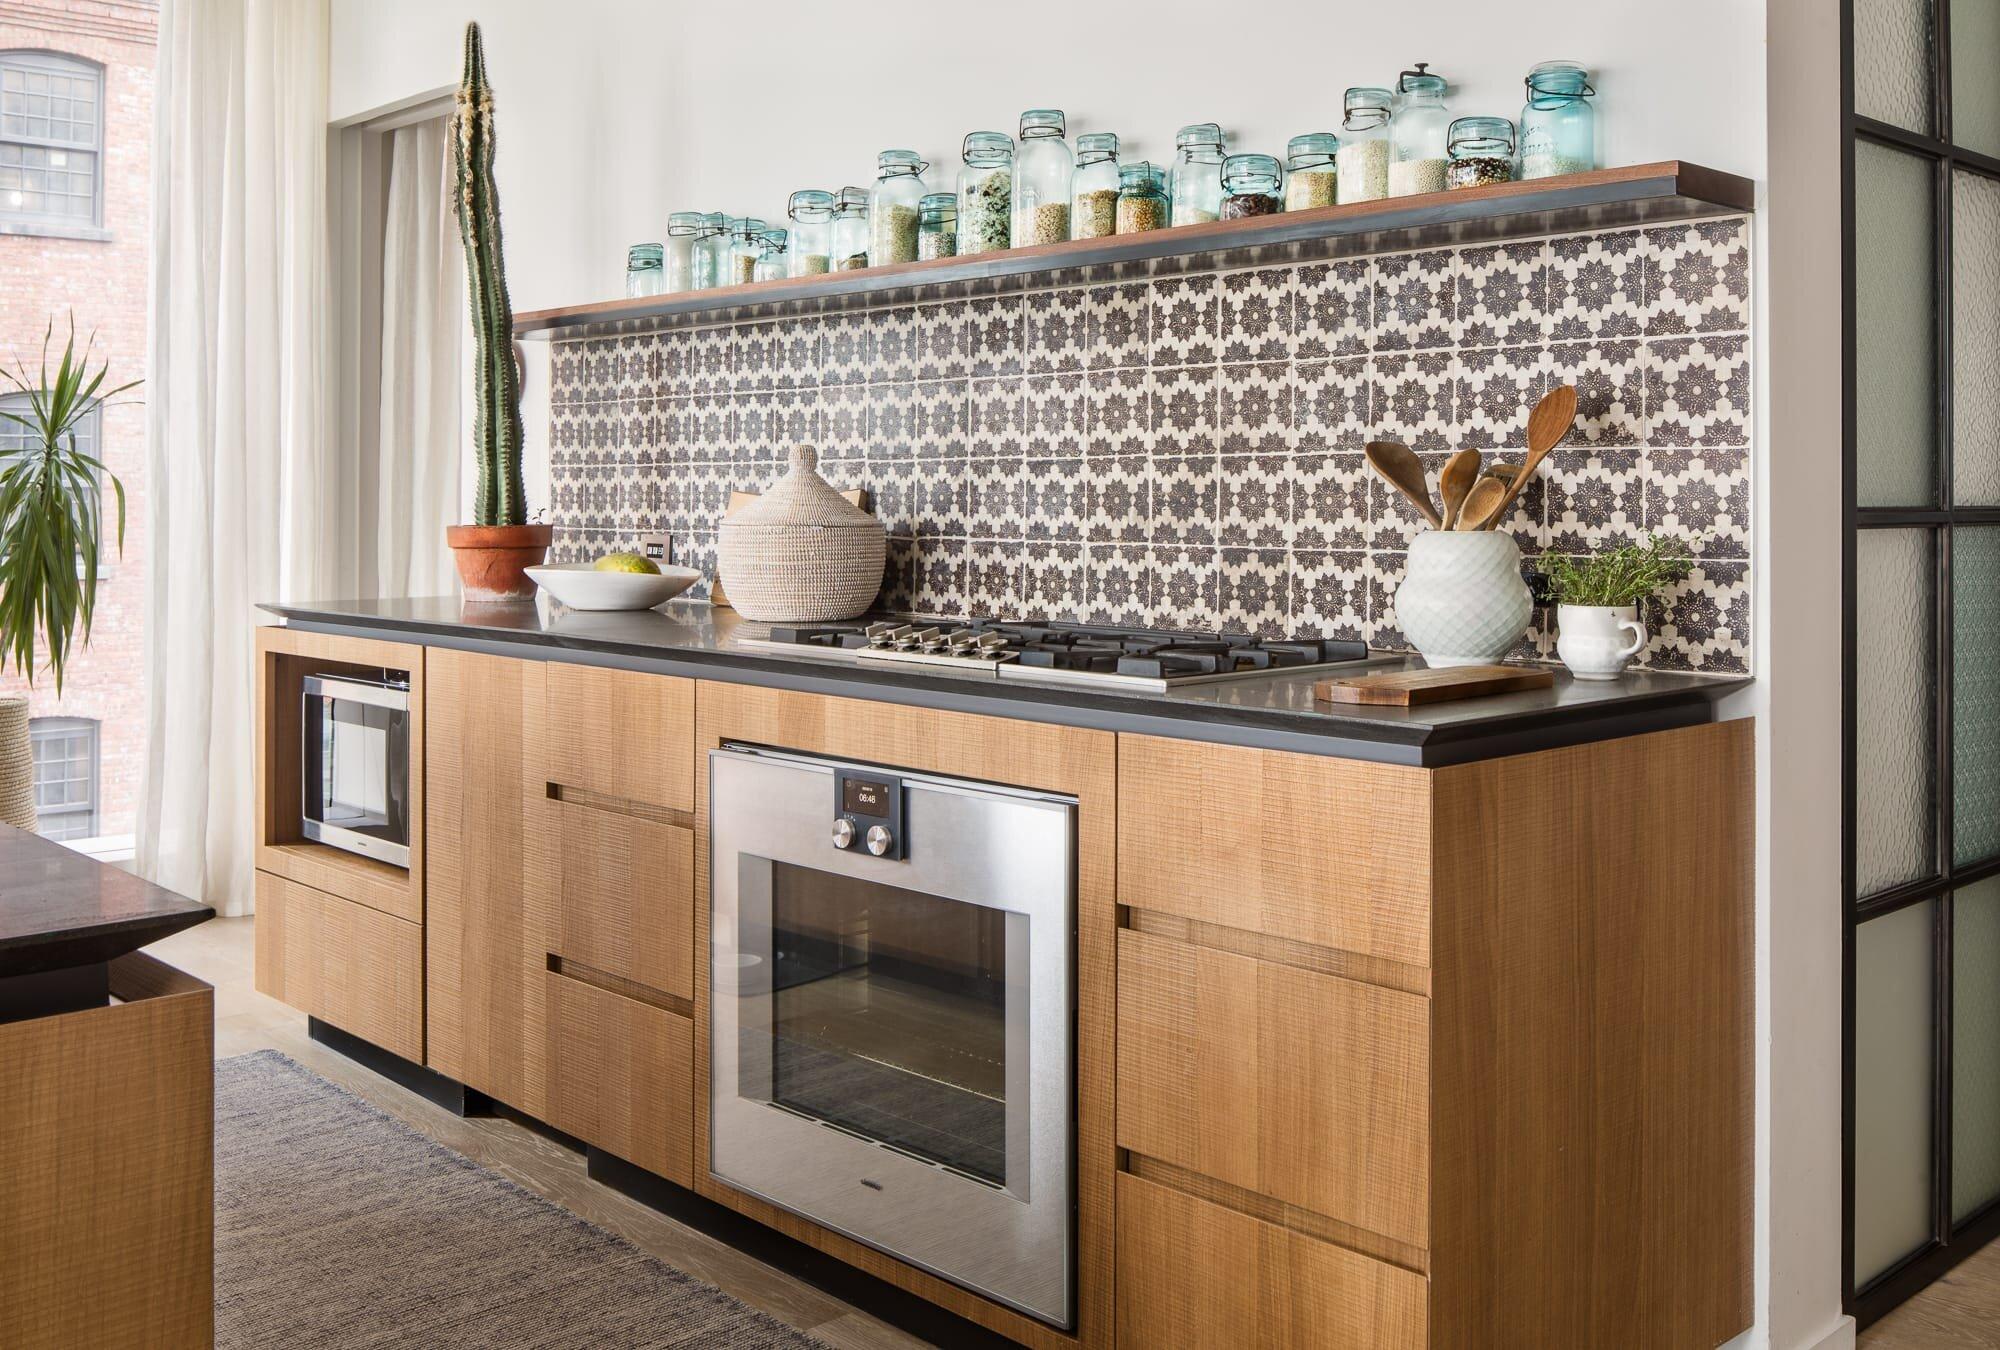 Gorgeous Kitchen designed by Alloy Development